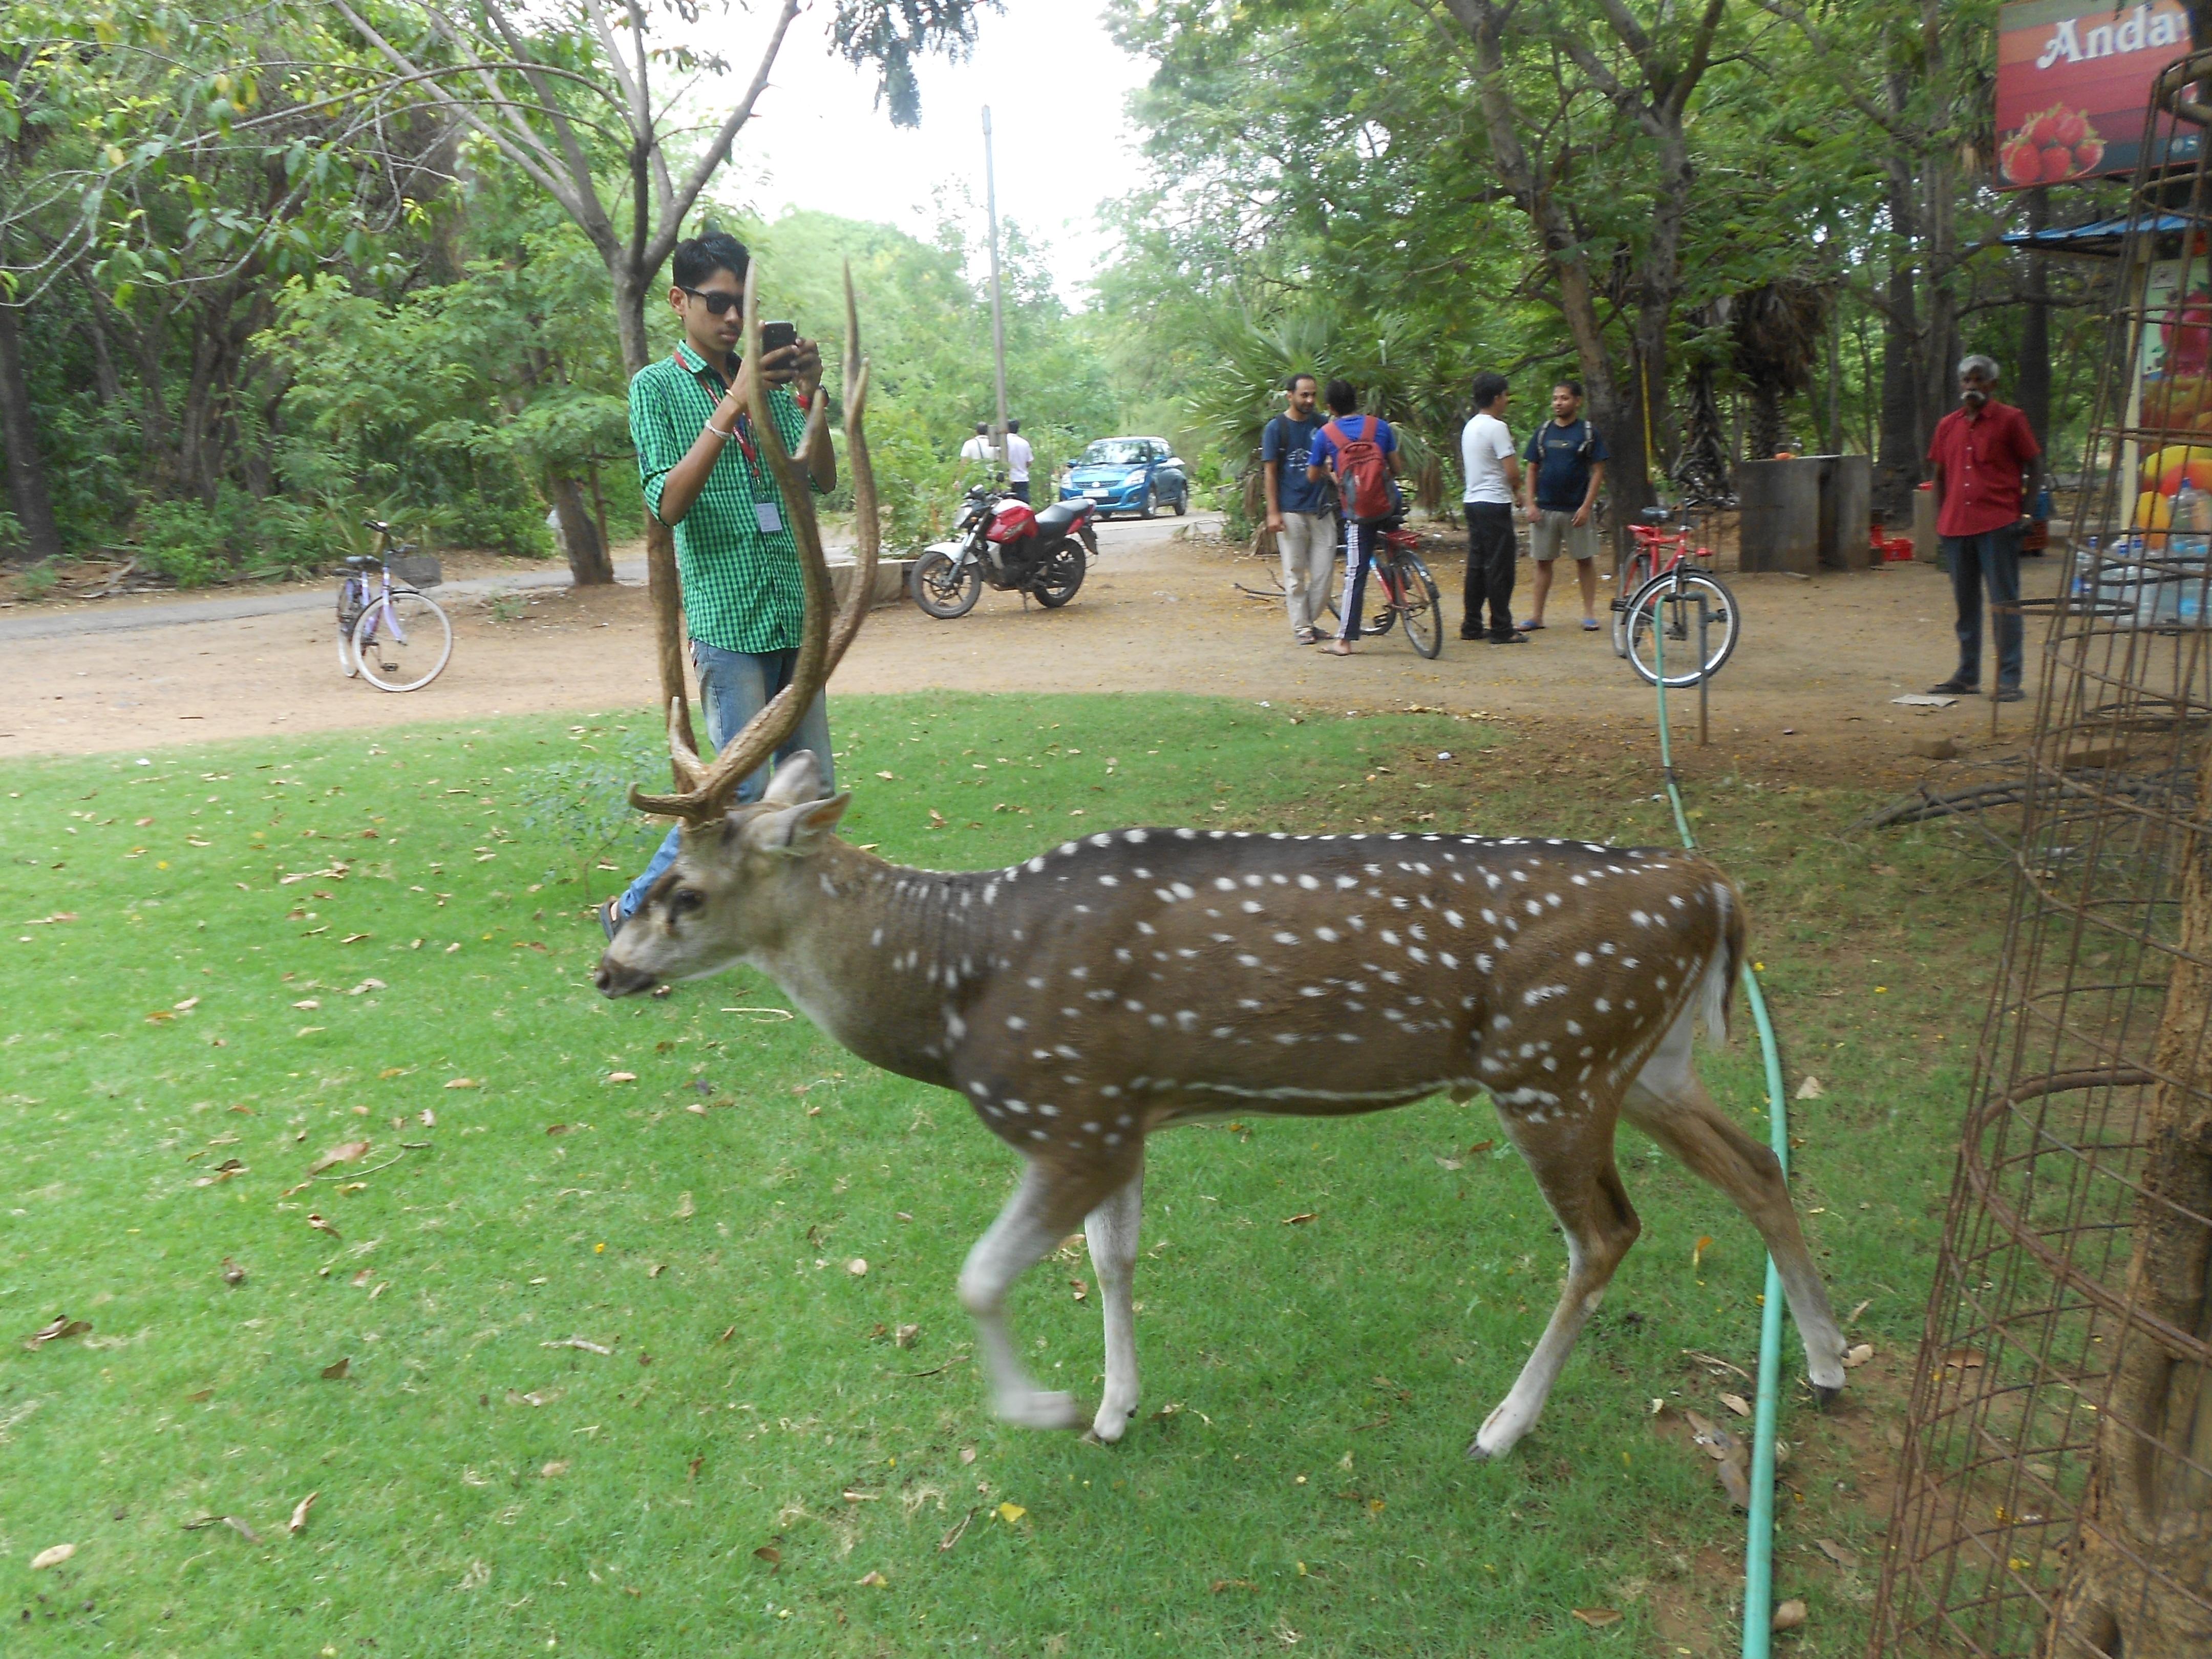 IIT Madras Wikipedia: File:Deer Roaming Outside The Mess Of IIT Madras.jpg